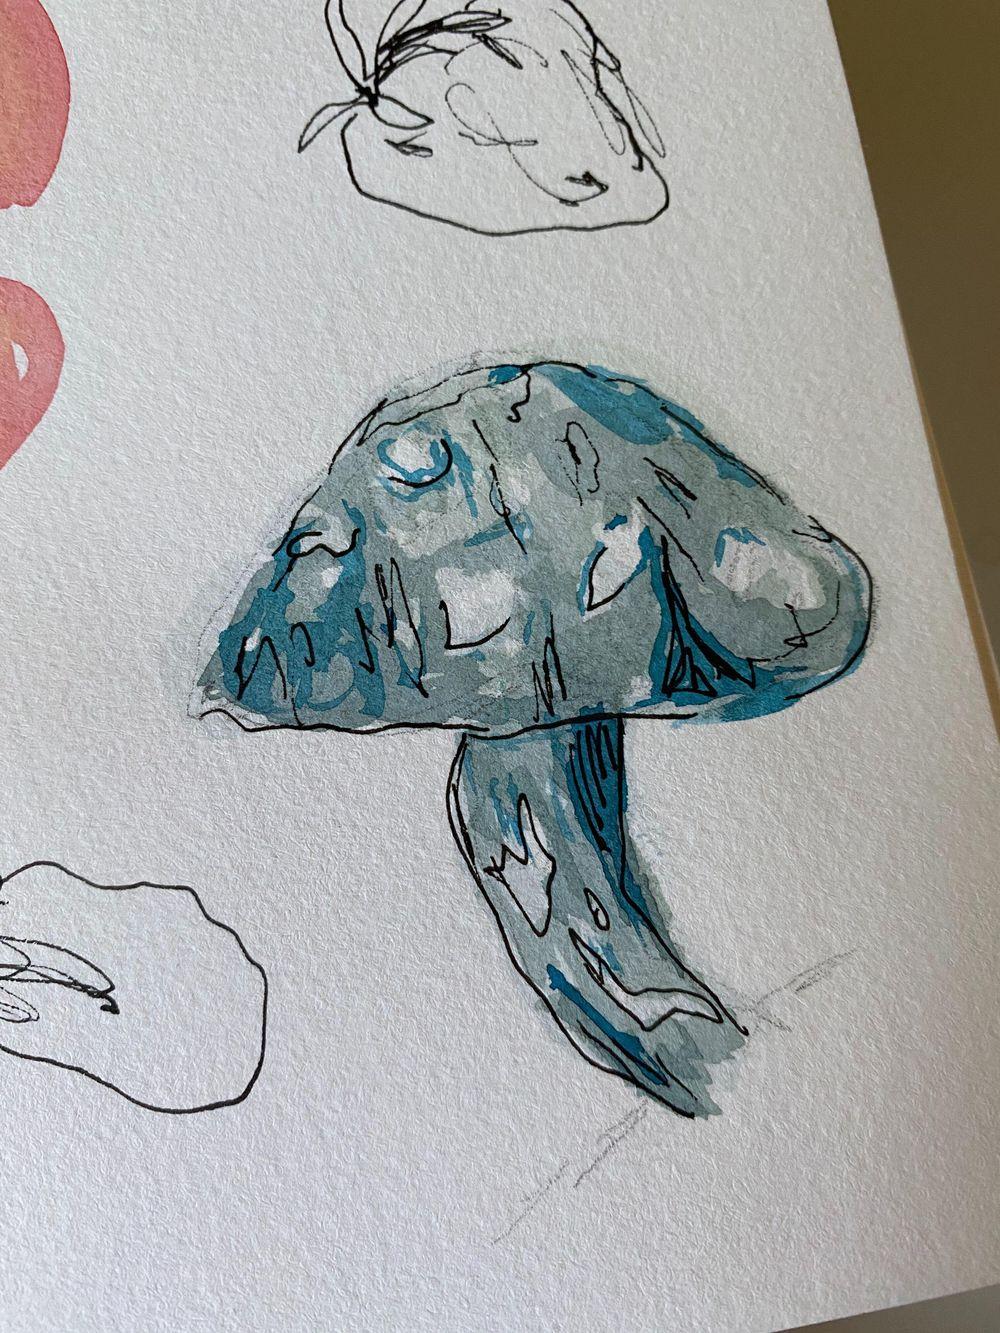 mushrooms! - image 3 - student project